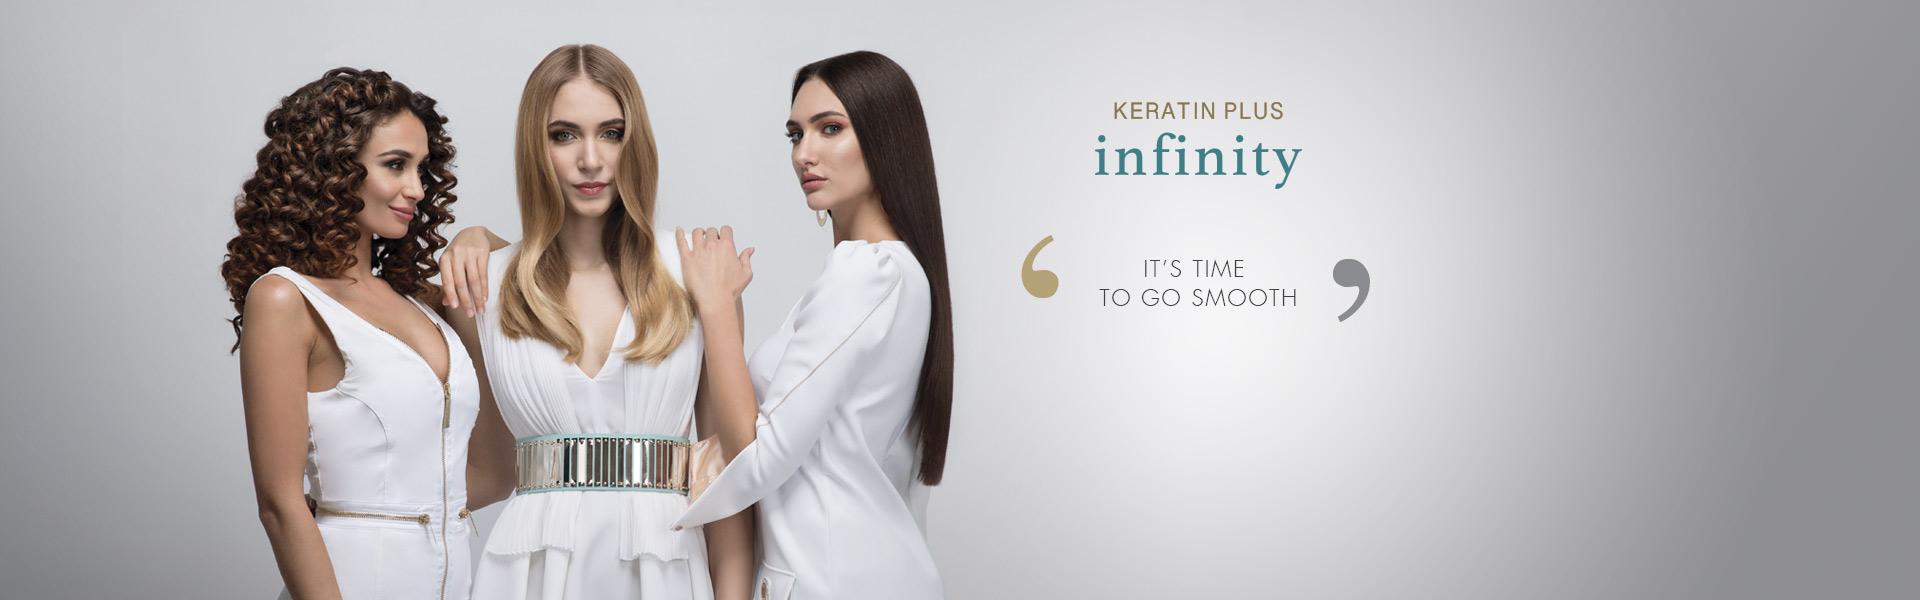 banner_centrali_Infinity